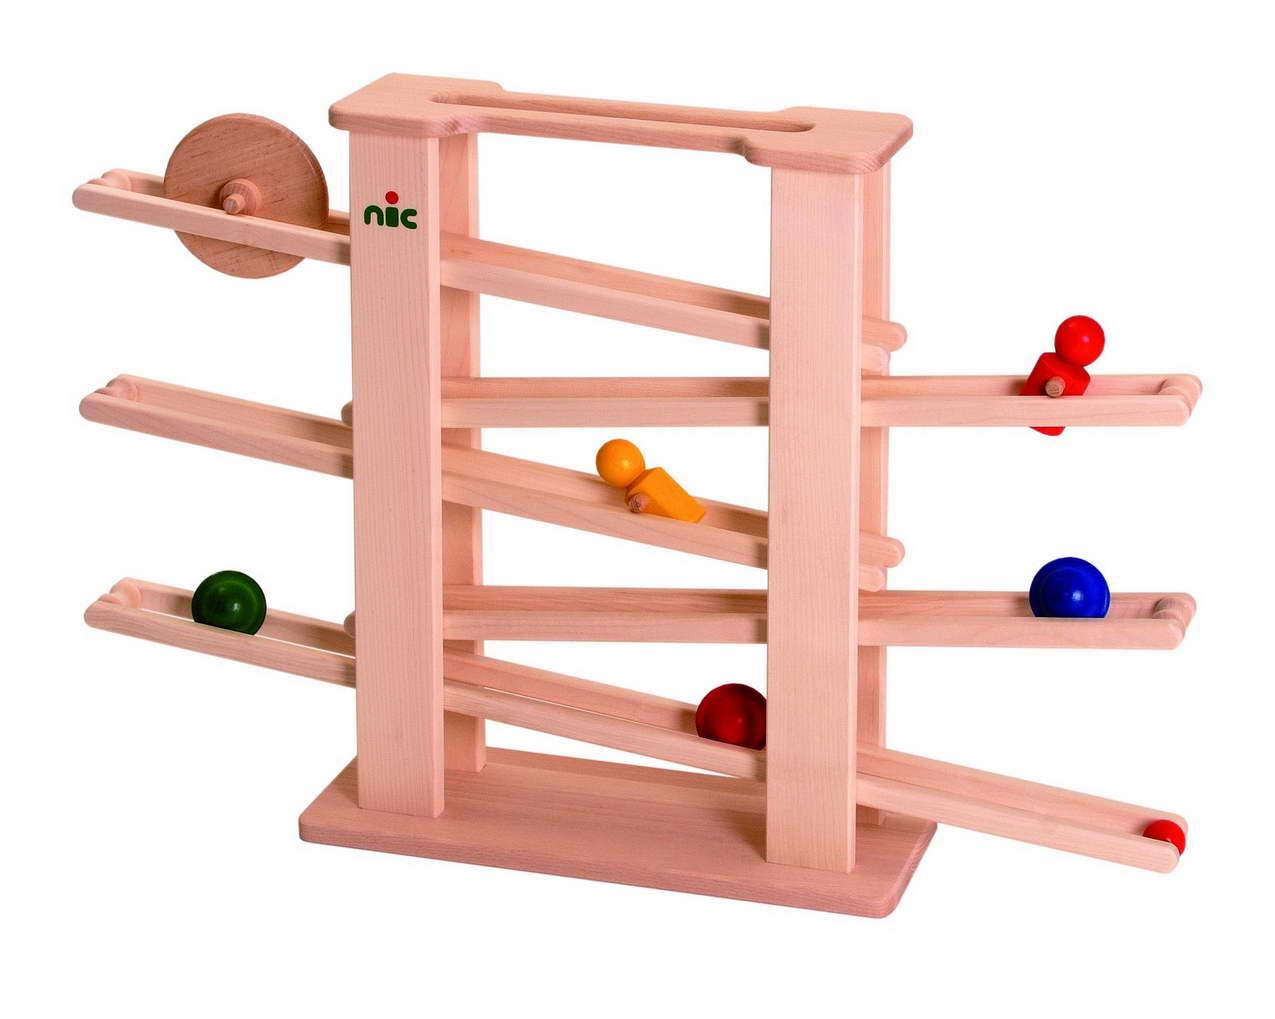 Spielzeug ab 3 Jahre Multibahn